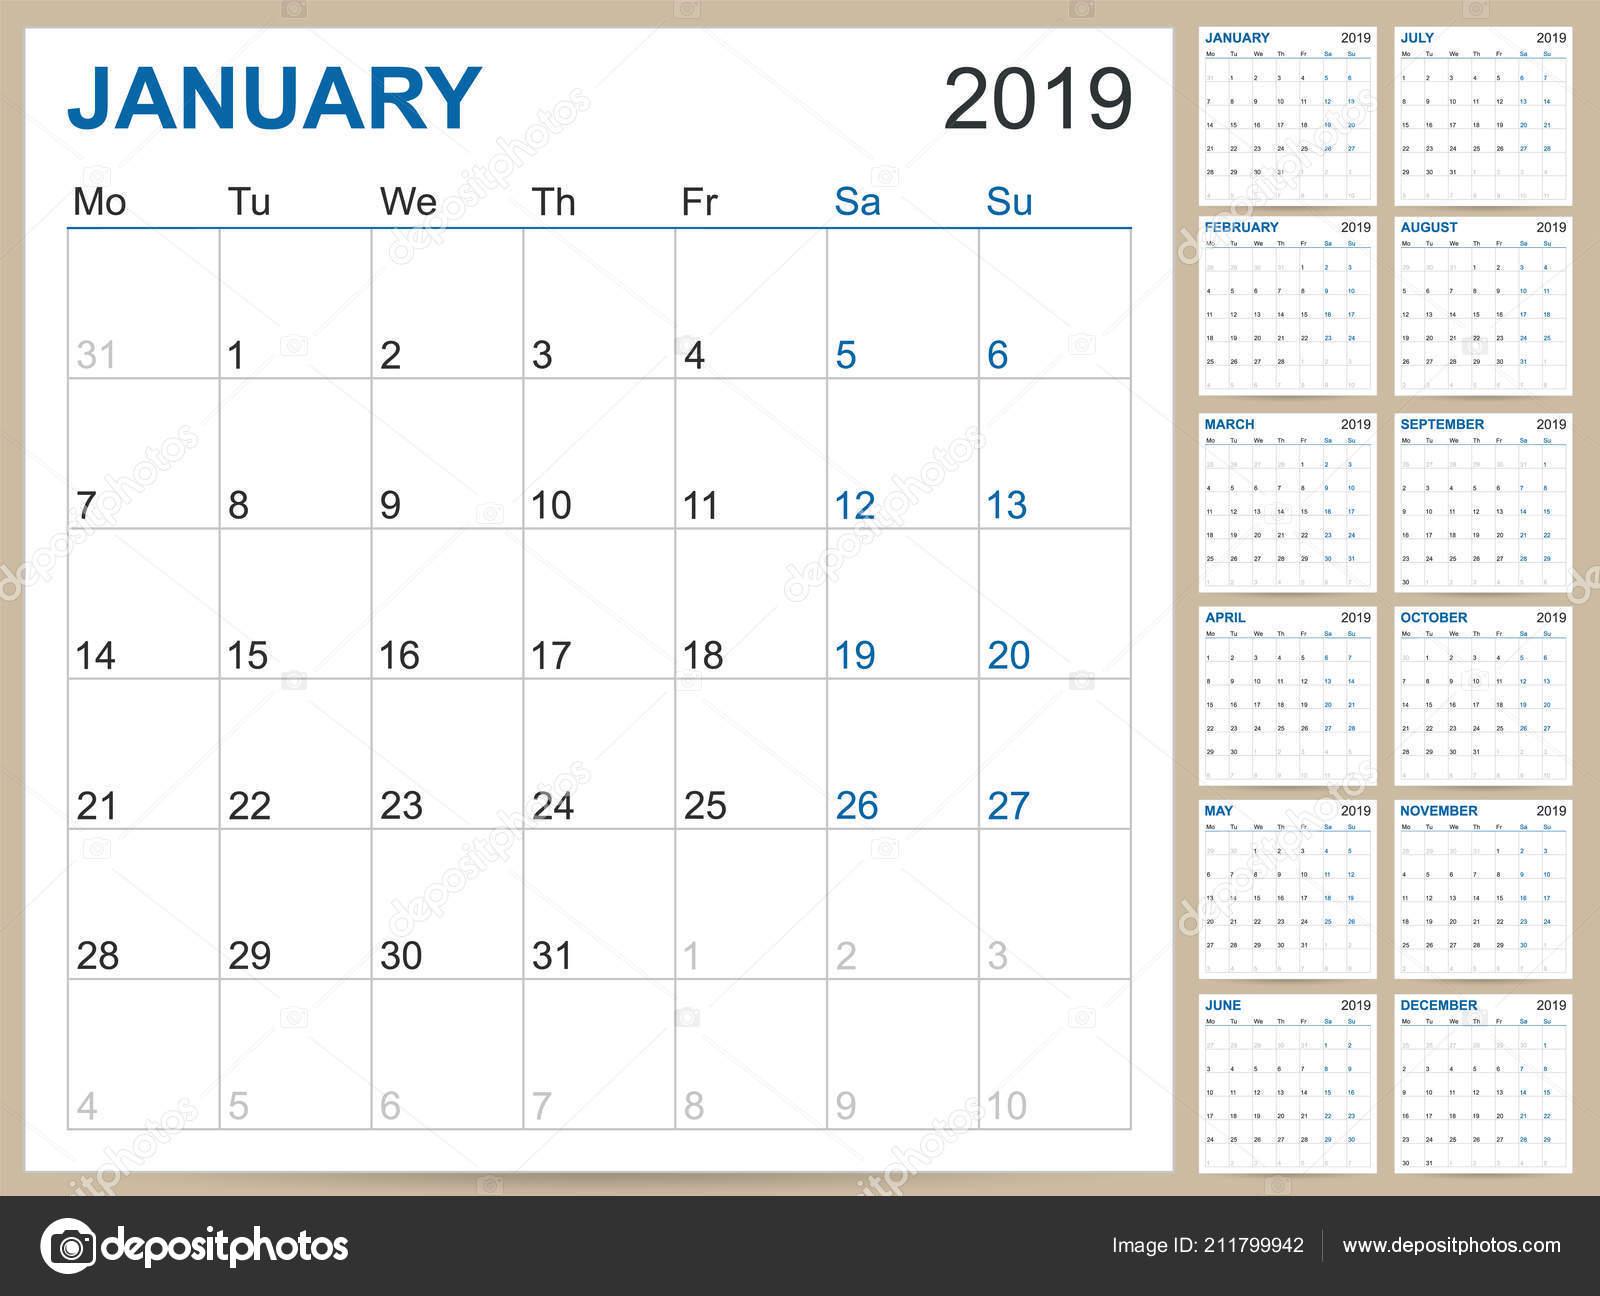 english planning calendar 2019 english calendar template year 2019